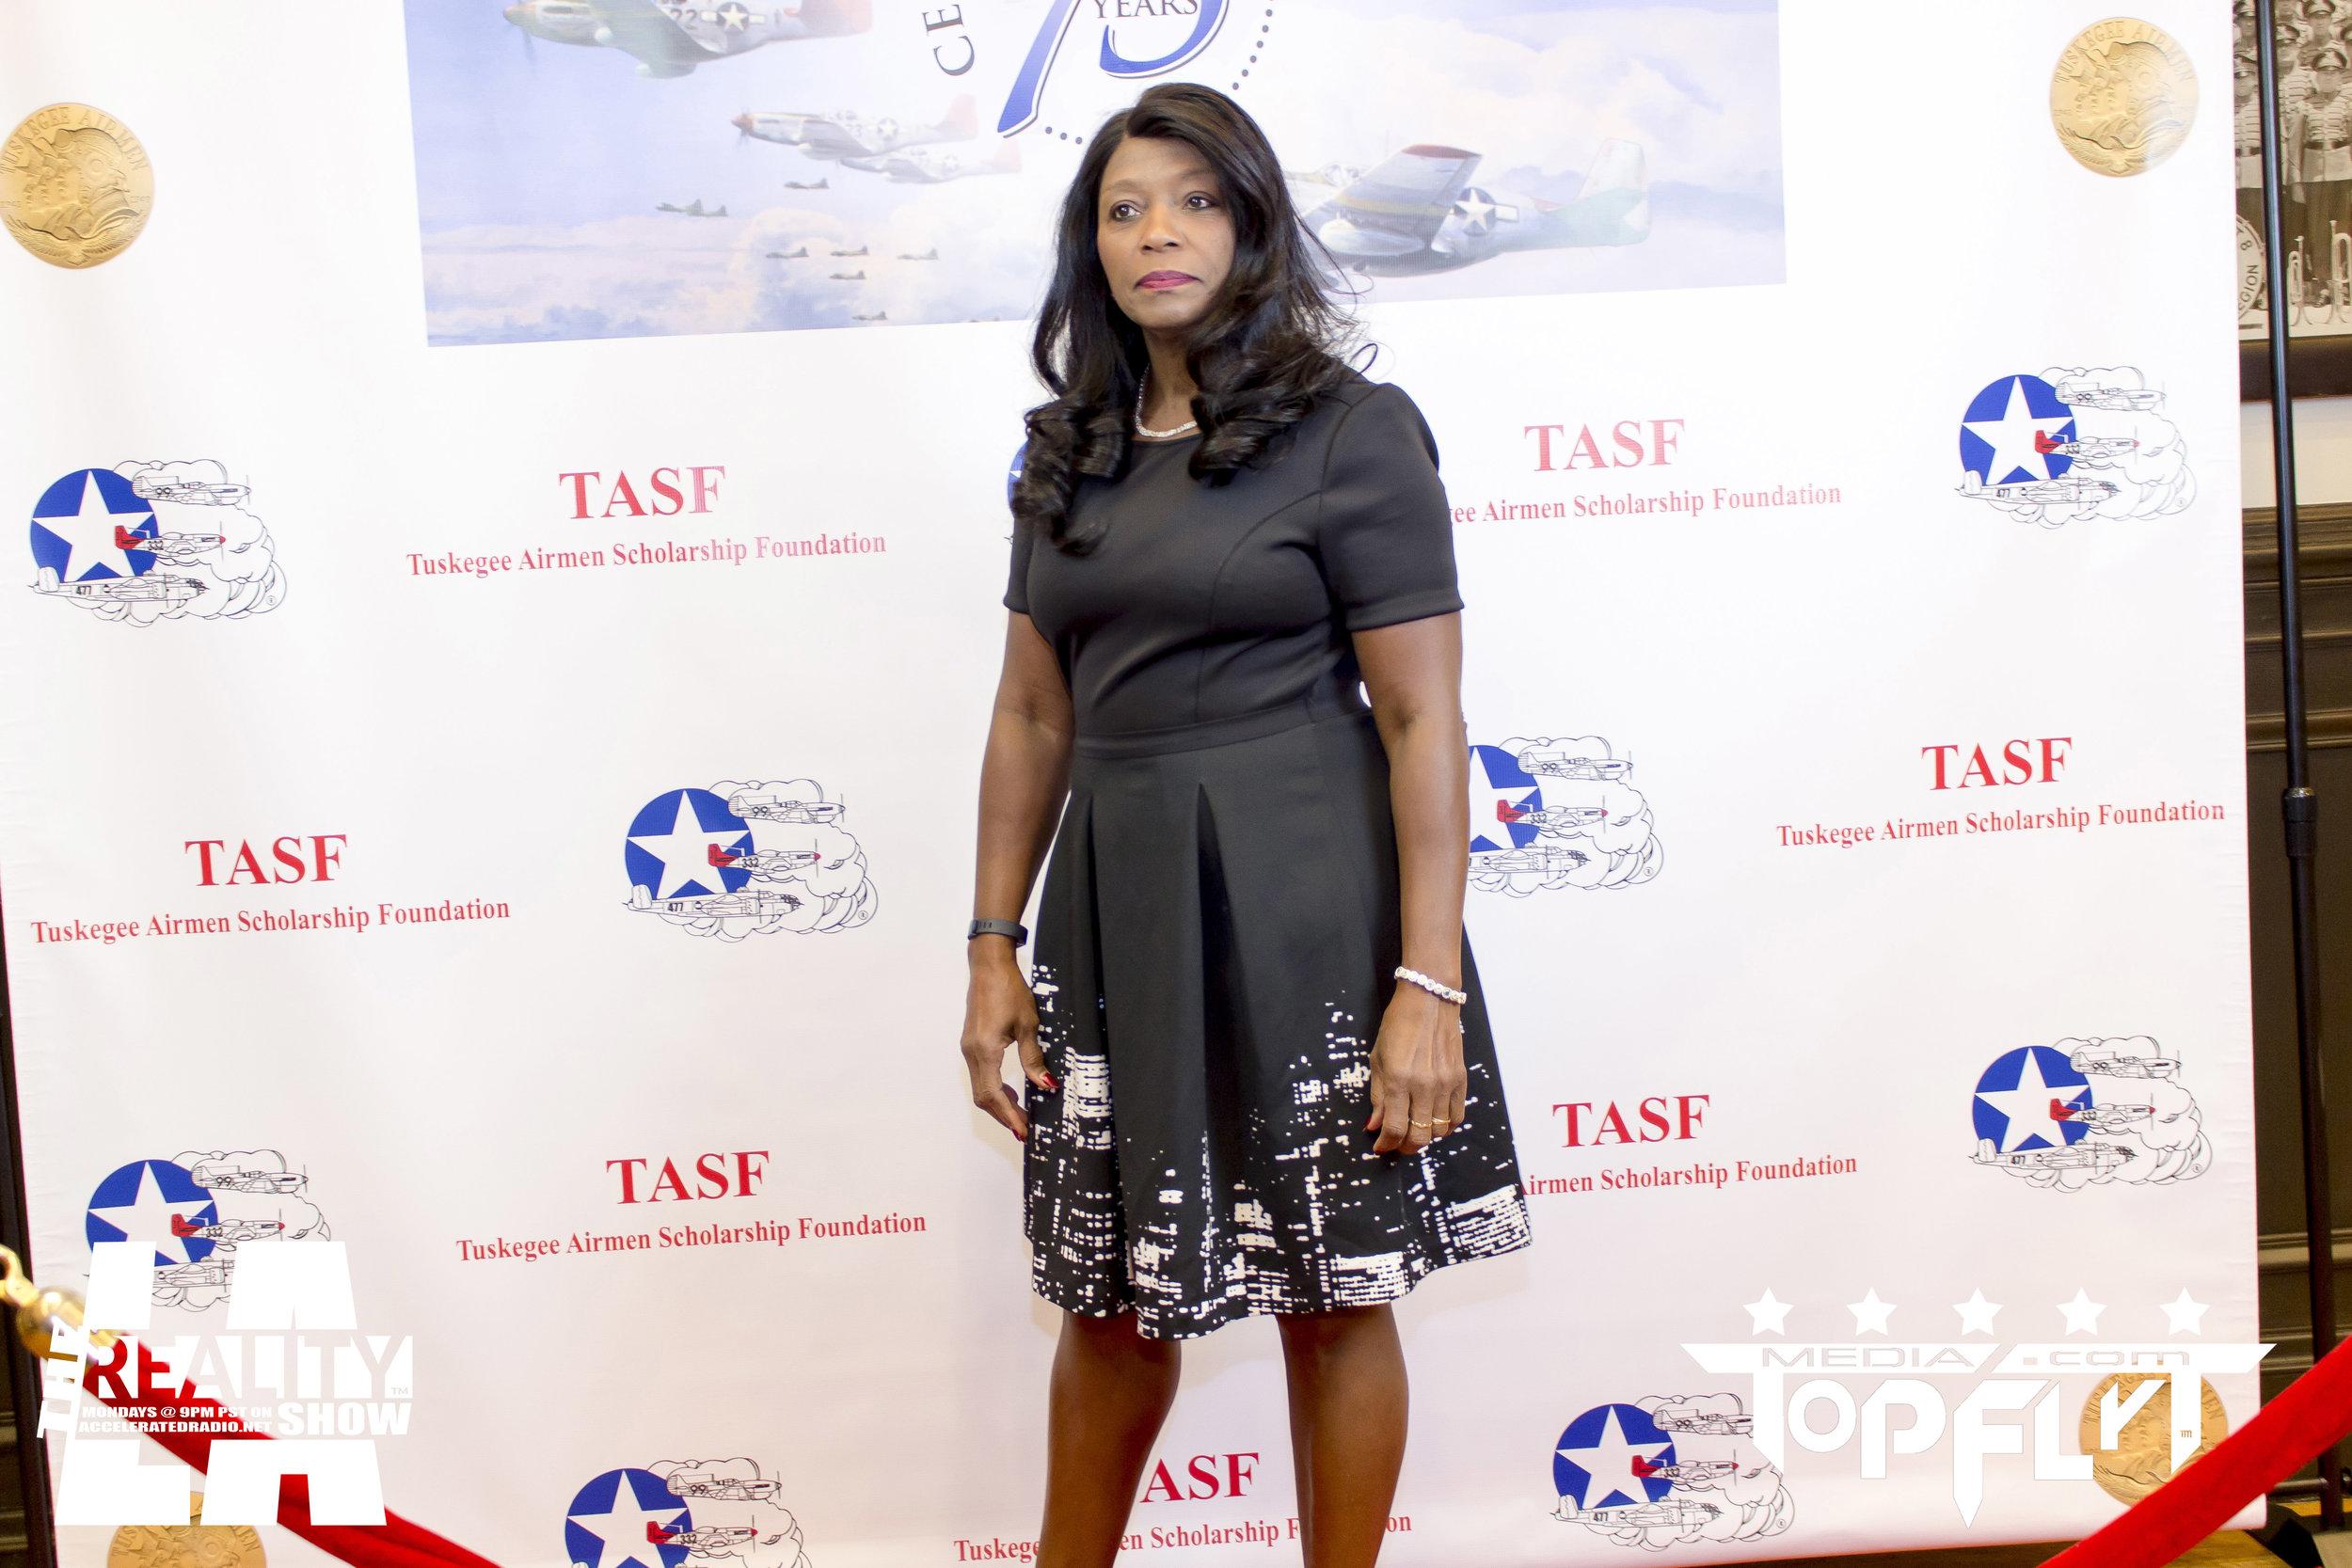 The Reality Show LA - Tuskegee Airmen 75th Anniversary VIP Reception_4.jpg